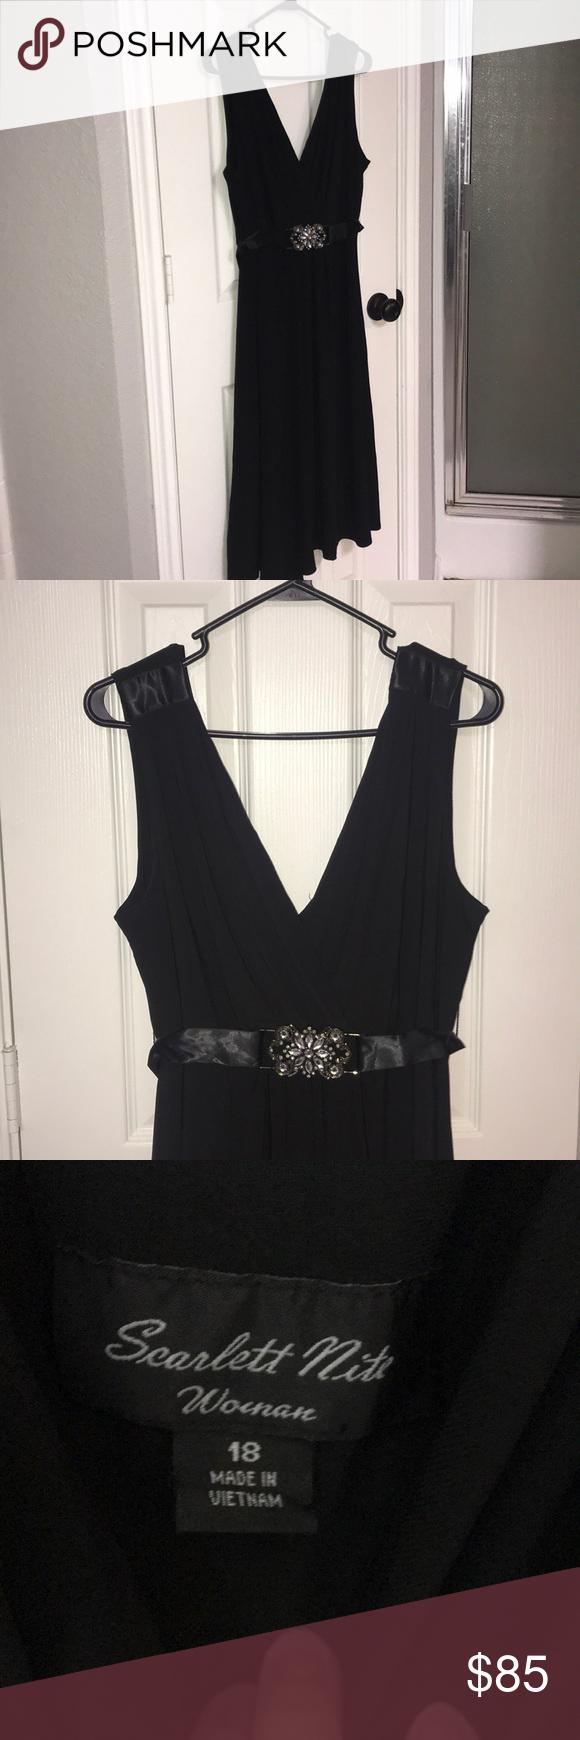 Euc Midi Black Formal Dress Size 18 Plus Size Size 18 Dress Black Dress Formal Dresses [ 1740 x 580 Pixel ]